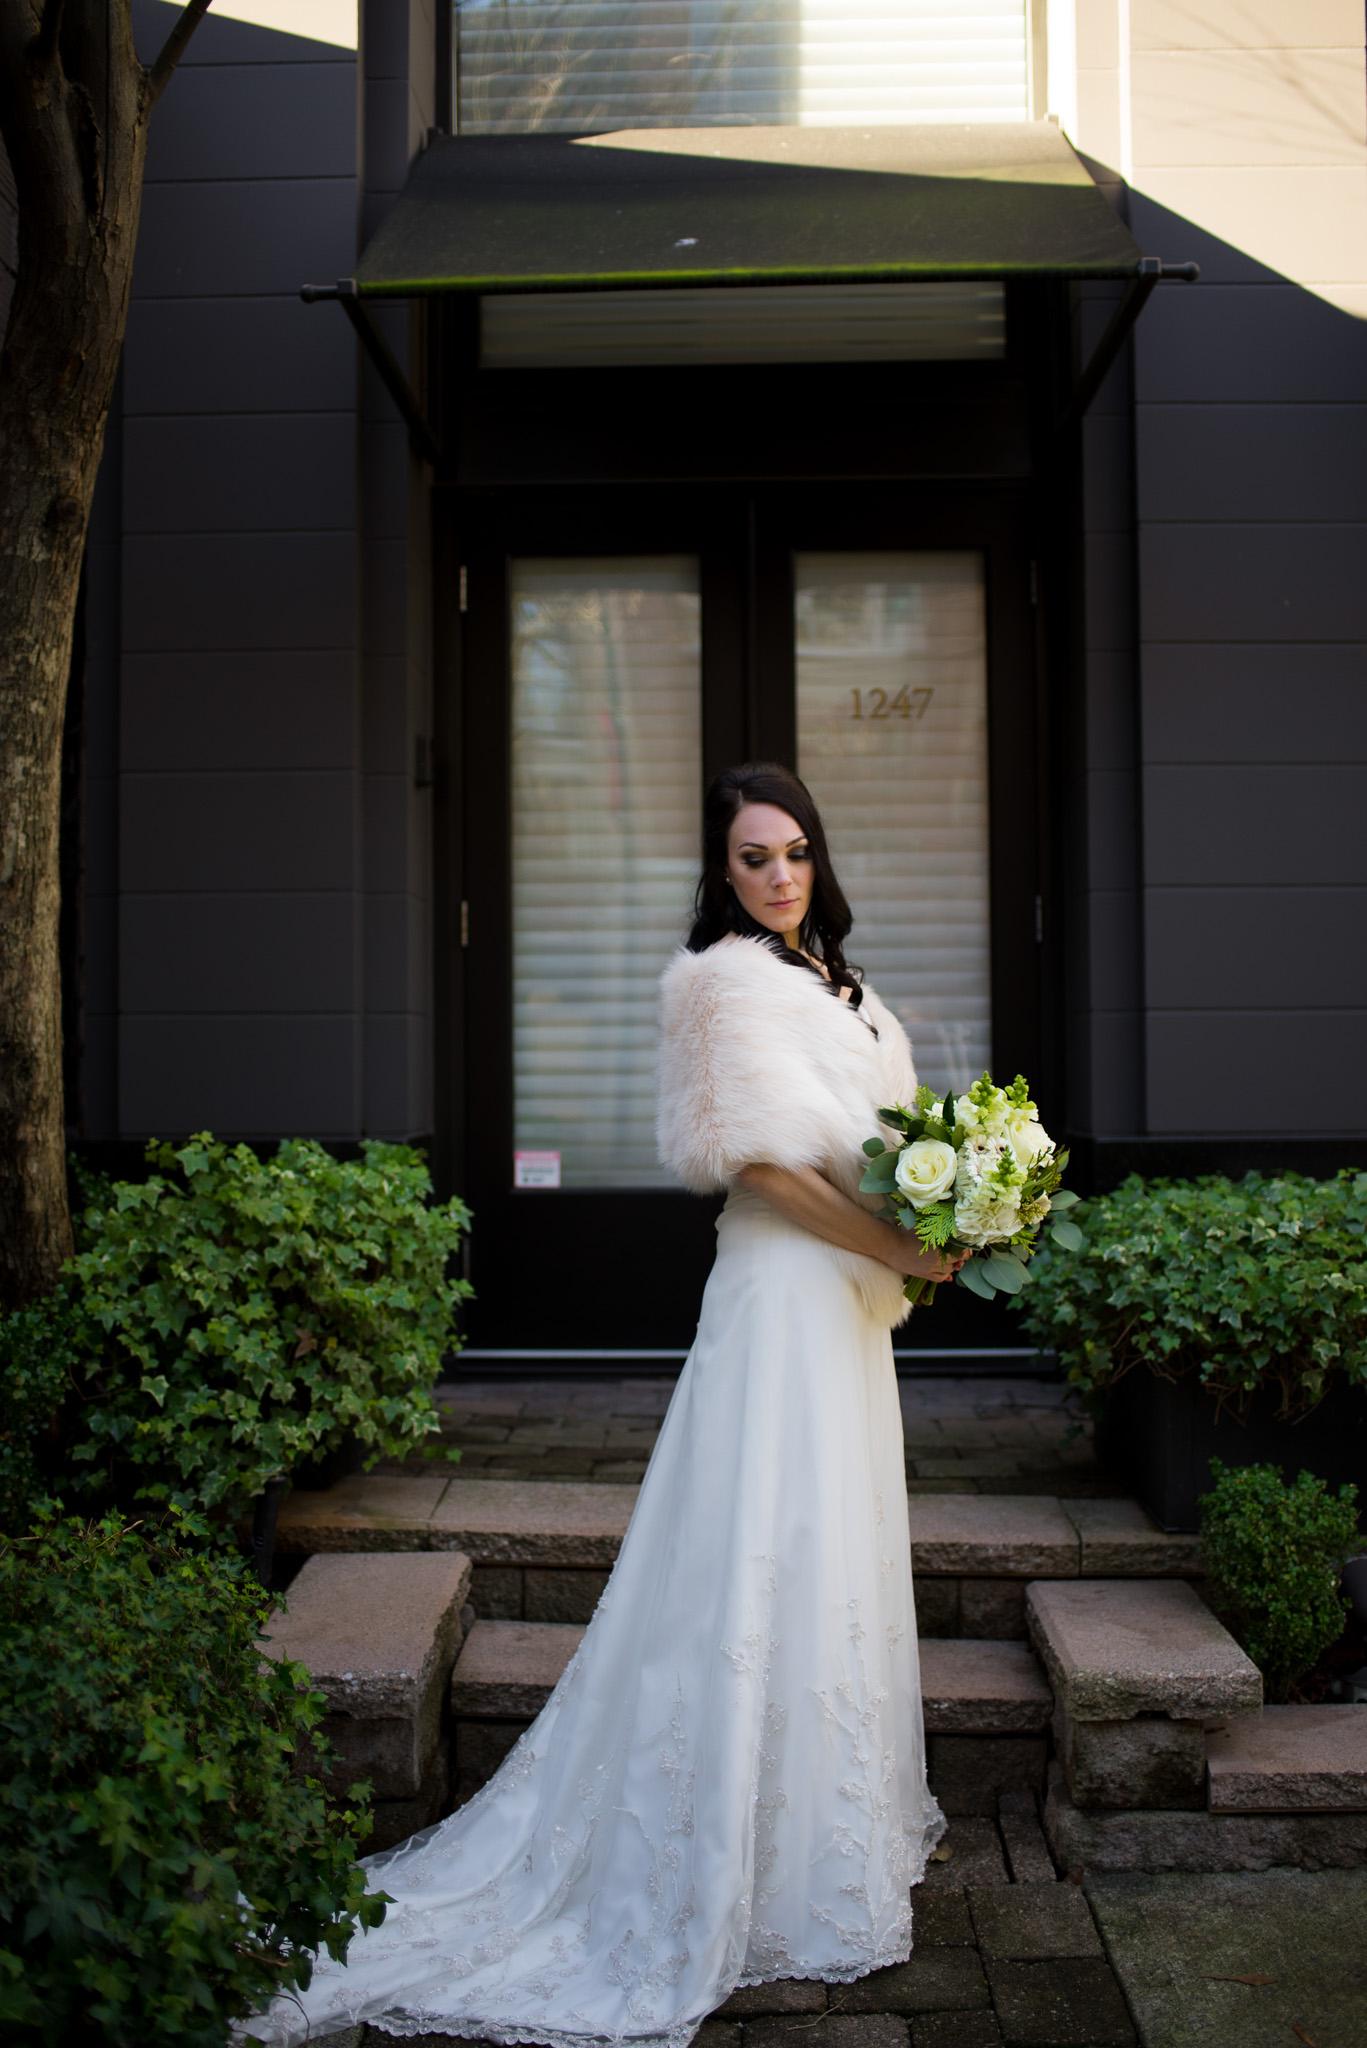 Brix and Mortar Wedding Photos-31.jpg